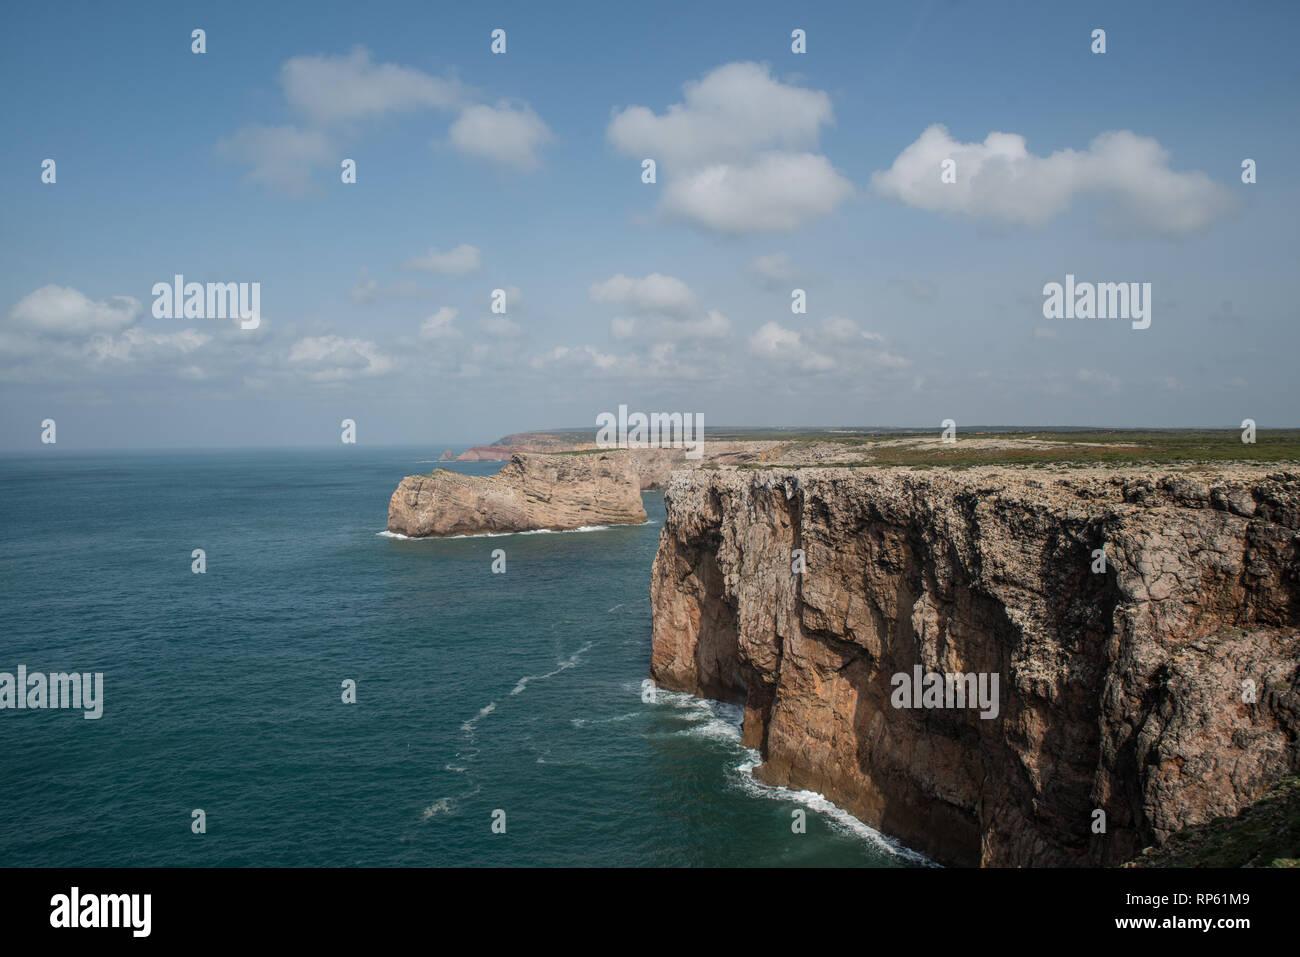 Ocean cliff, Sagres, Algarve, Portugal, February 2019 - Stock Image